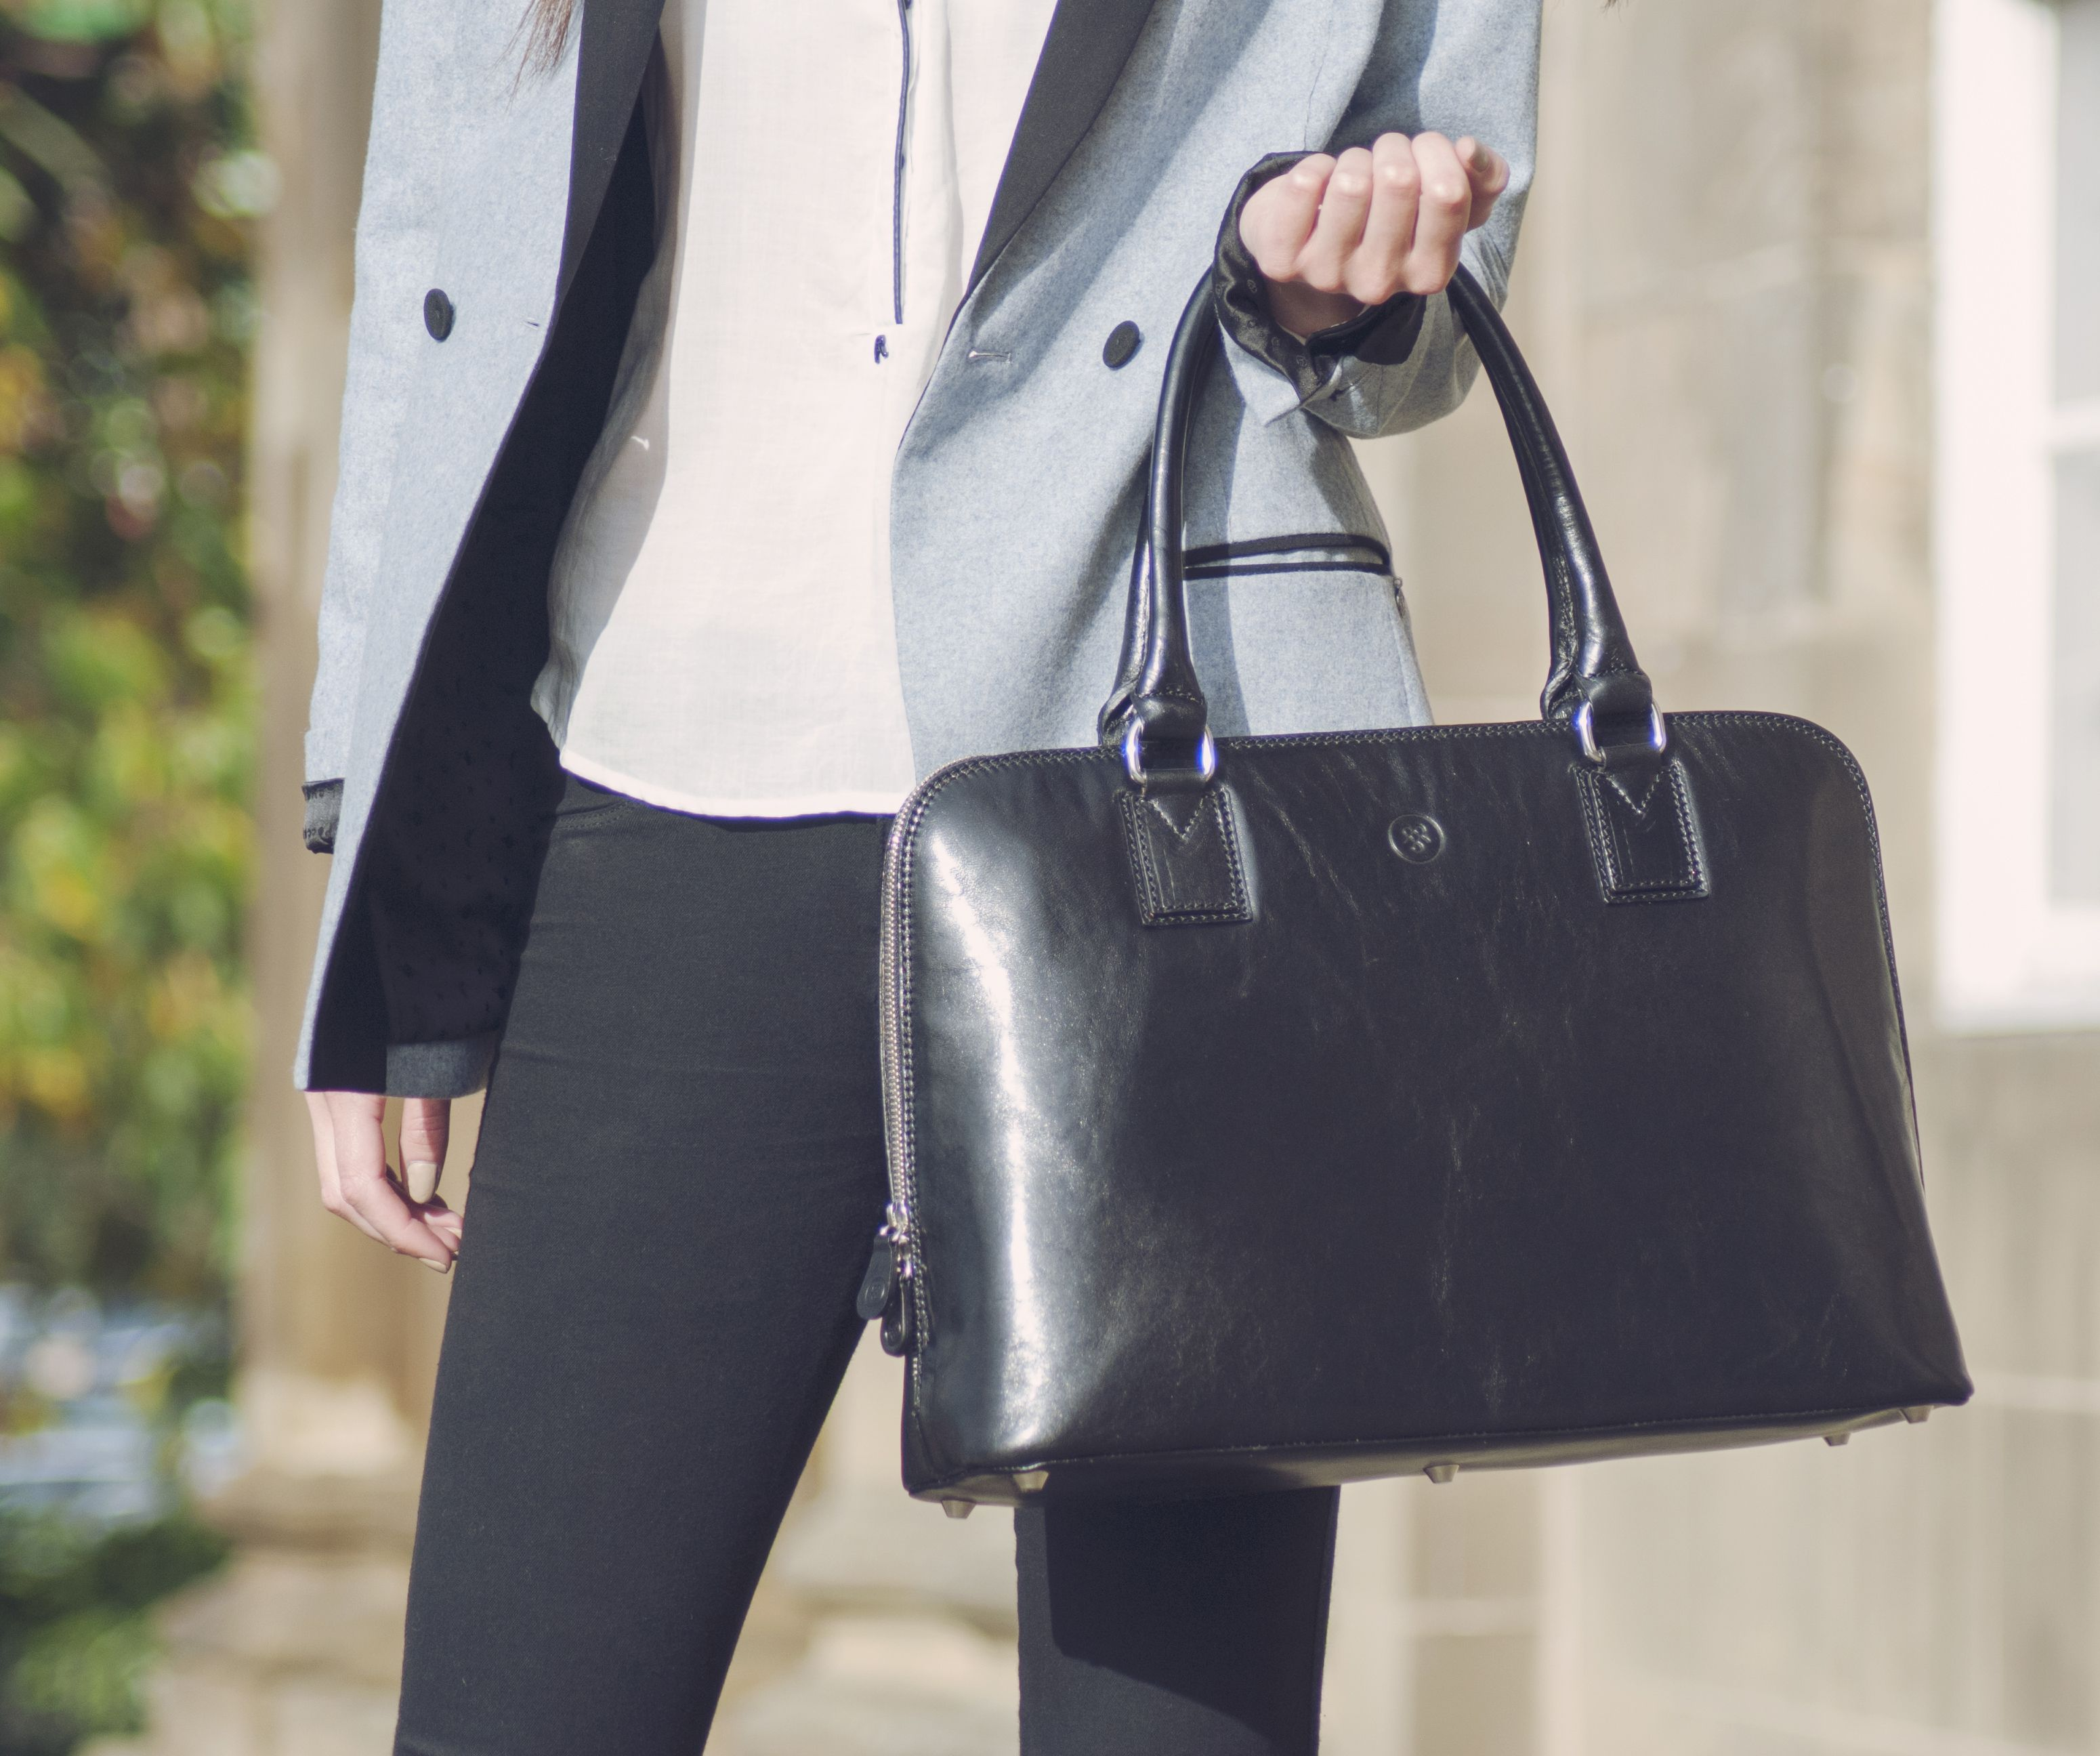 b3ac0ac327d40 Ladies leather laptop handbag by Maxwell Scott Bags.i want